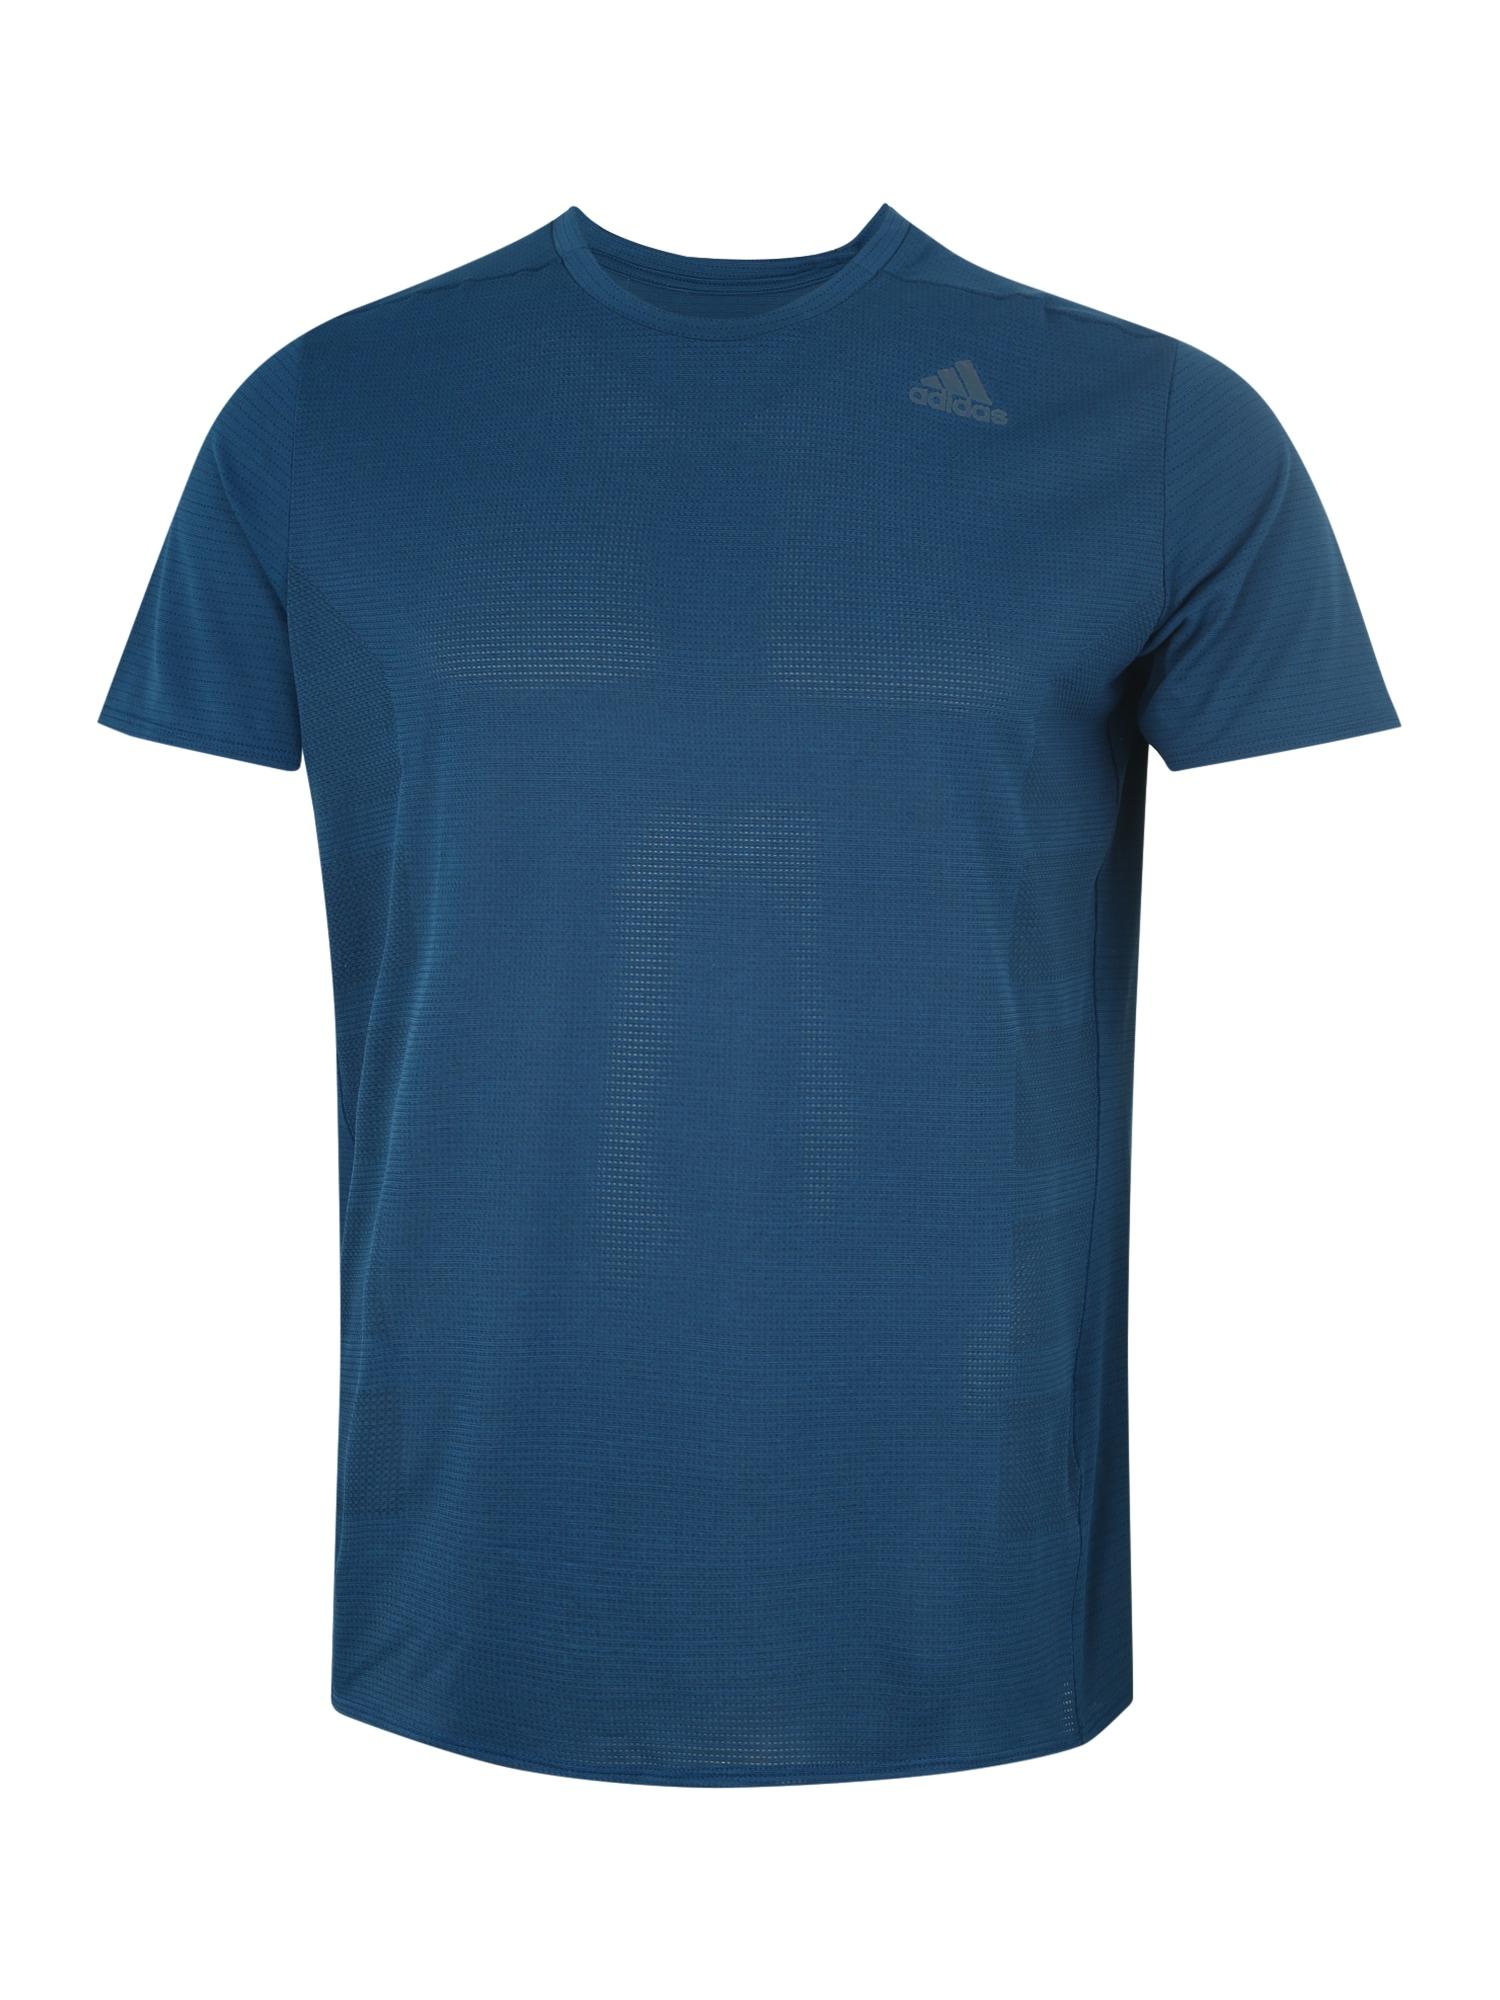 Funkční tričko Supernova marine modrá ADIDAS PERFORMANCE